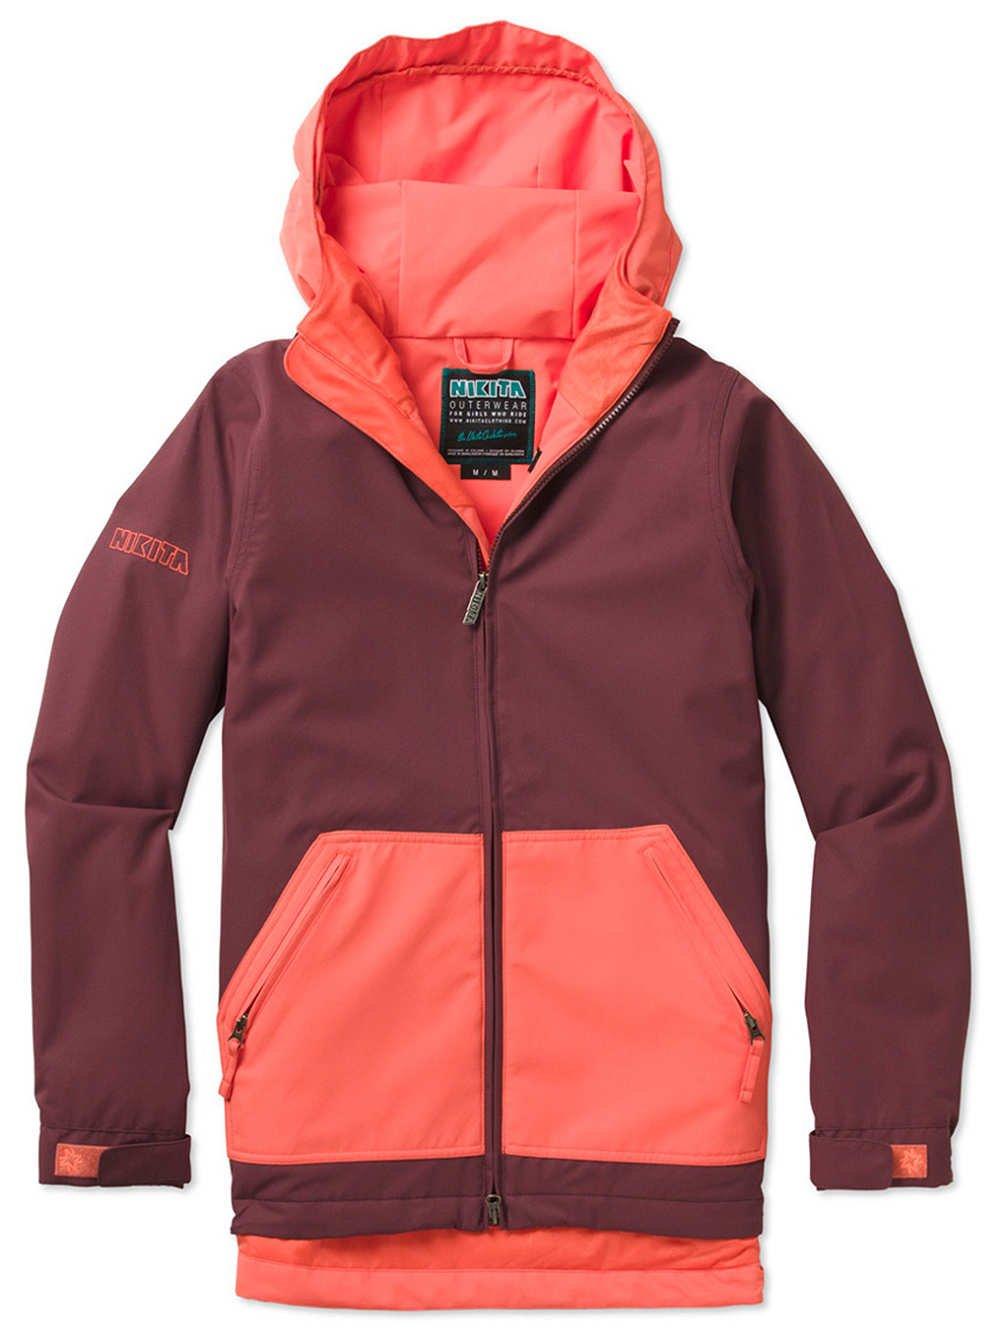 Damen Snowboard Jacke Nikita Diptail Jacket online bestellen